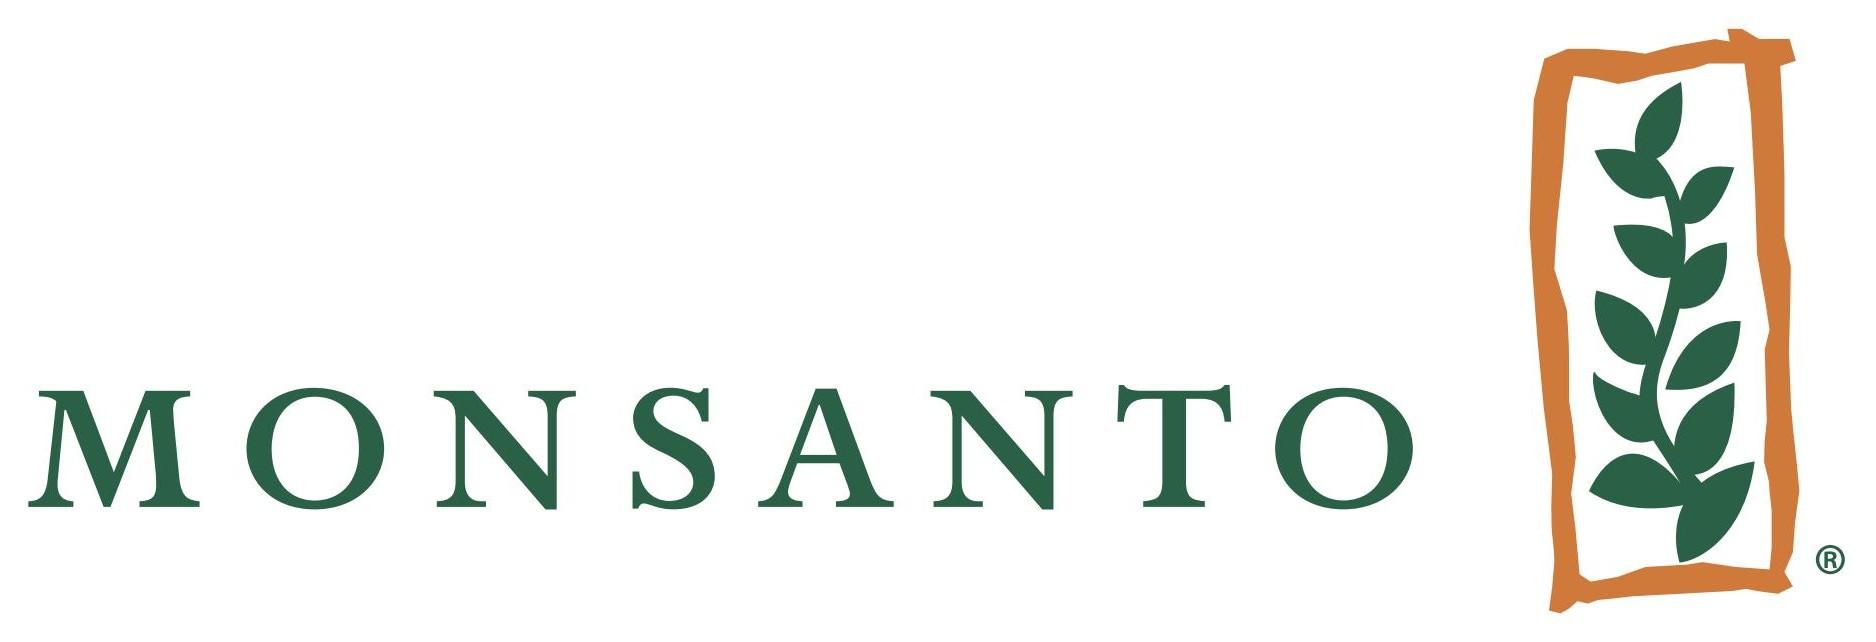 Monsanto named among greenest companies in Newsweek's 2016 Green Rankings